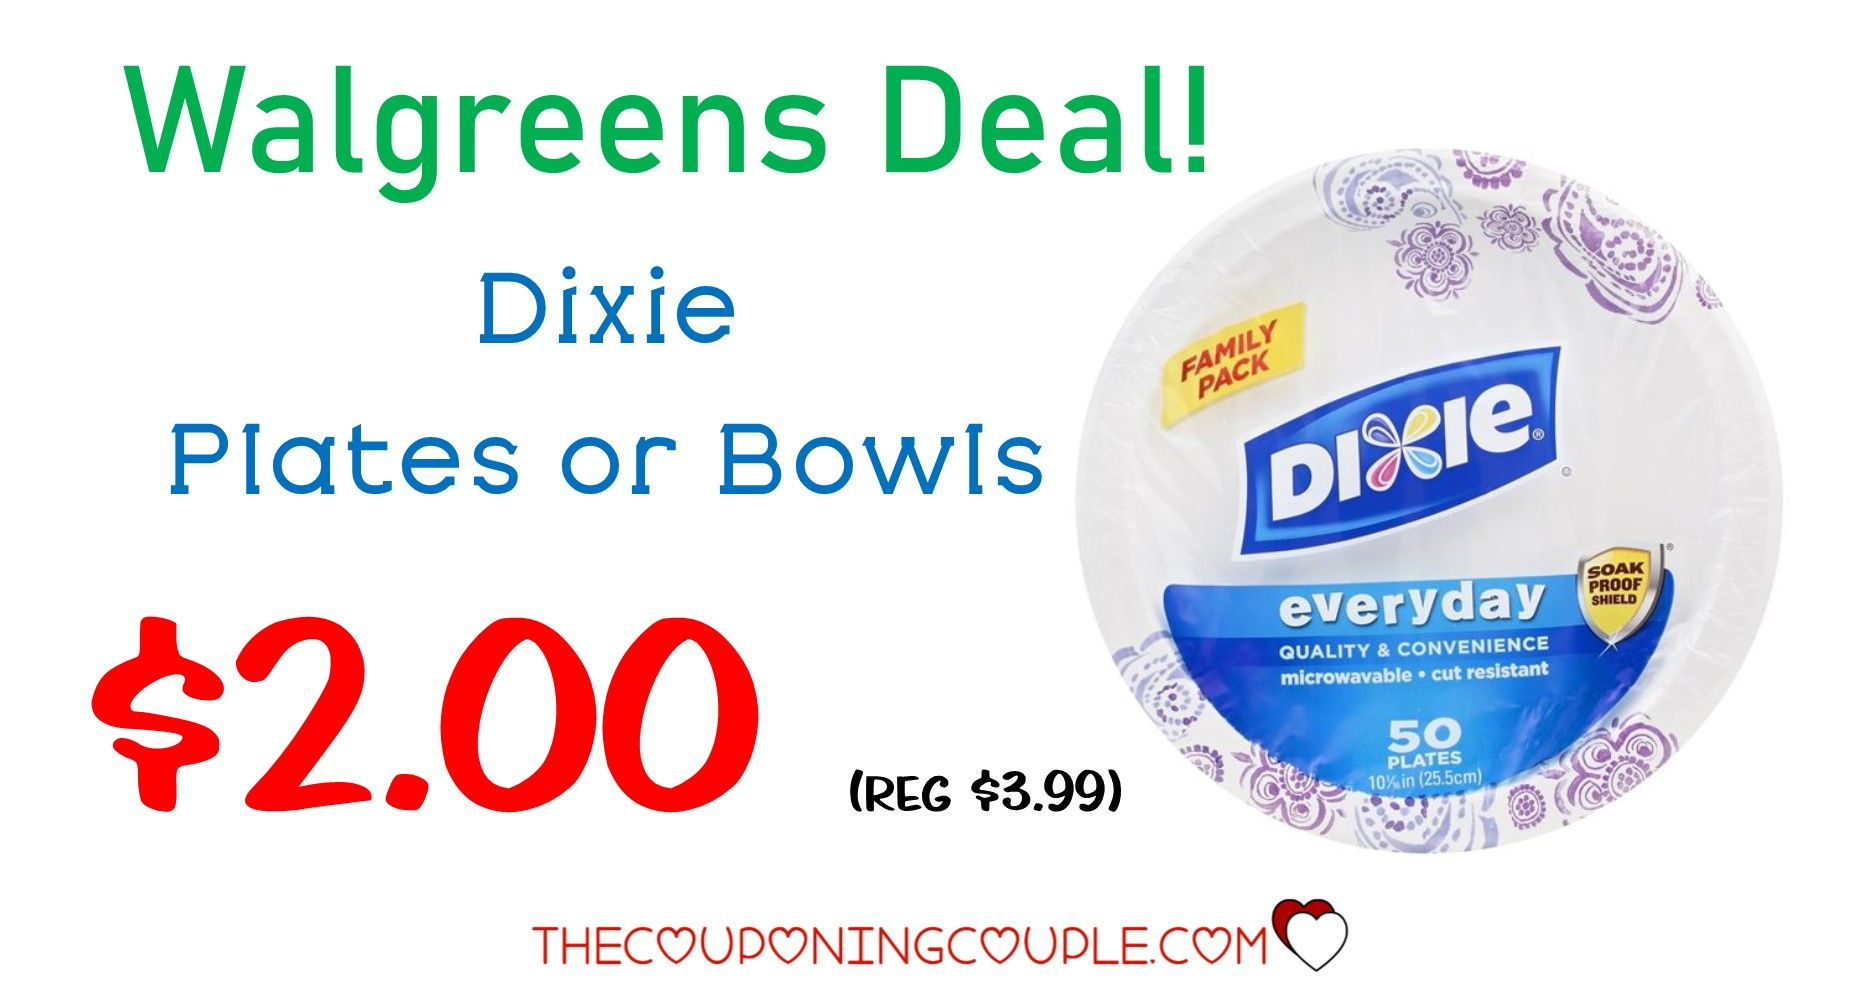 Dixie Plates Deal at Walmart! Stock Up! 0.48 (reg 2.48